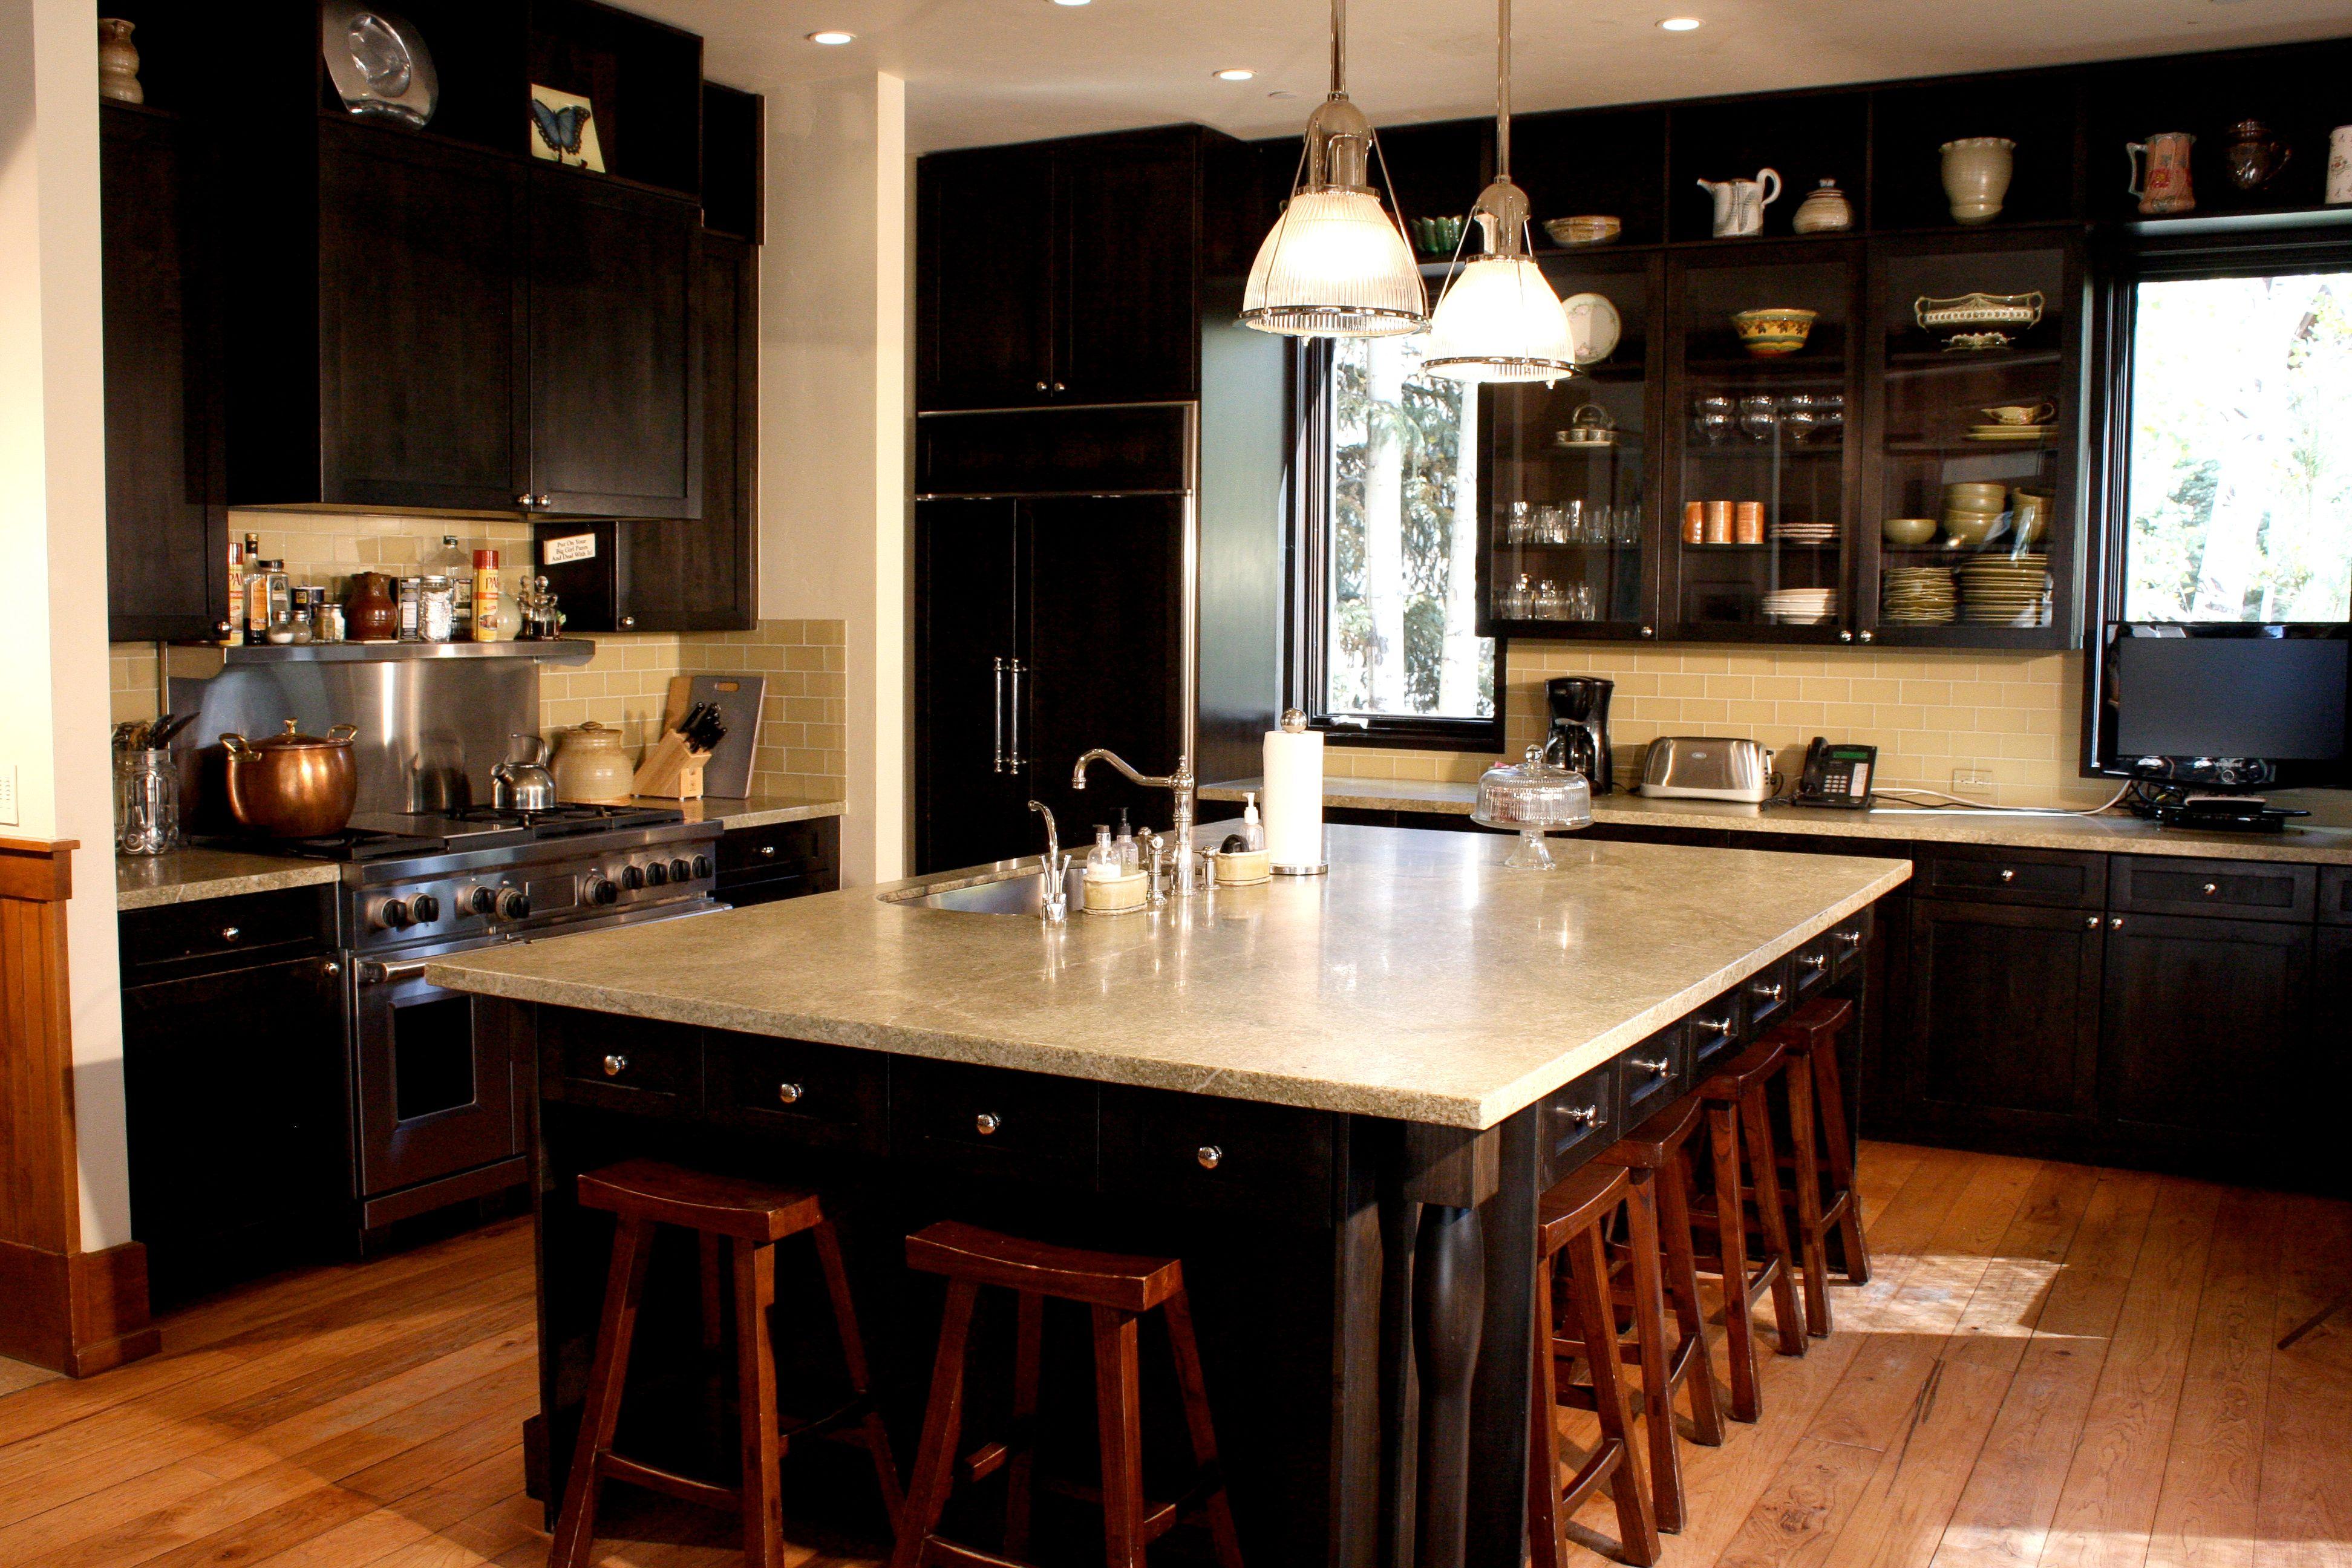 Best Tsm Design Inc Transitional Mountain Kitchen Black 400 x 300